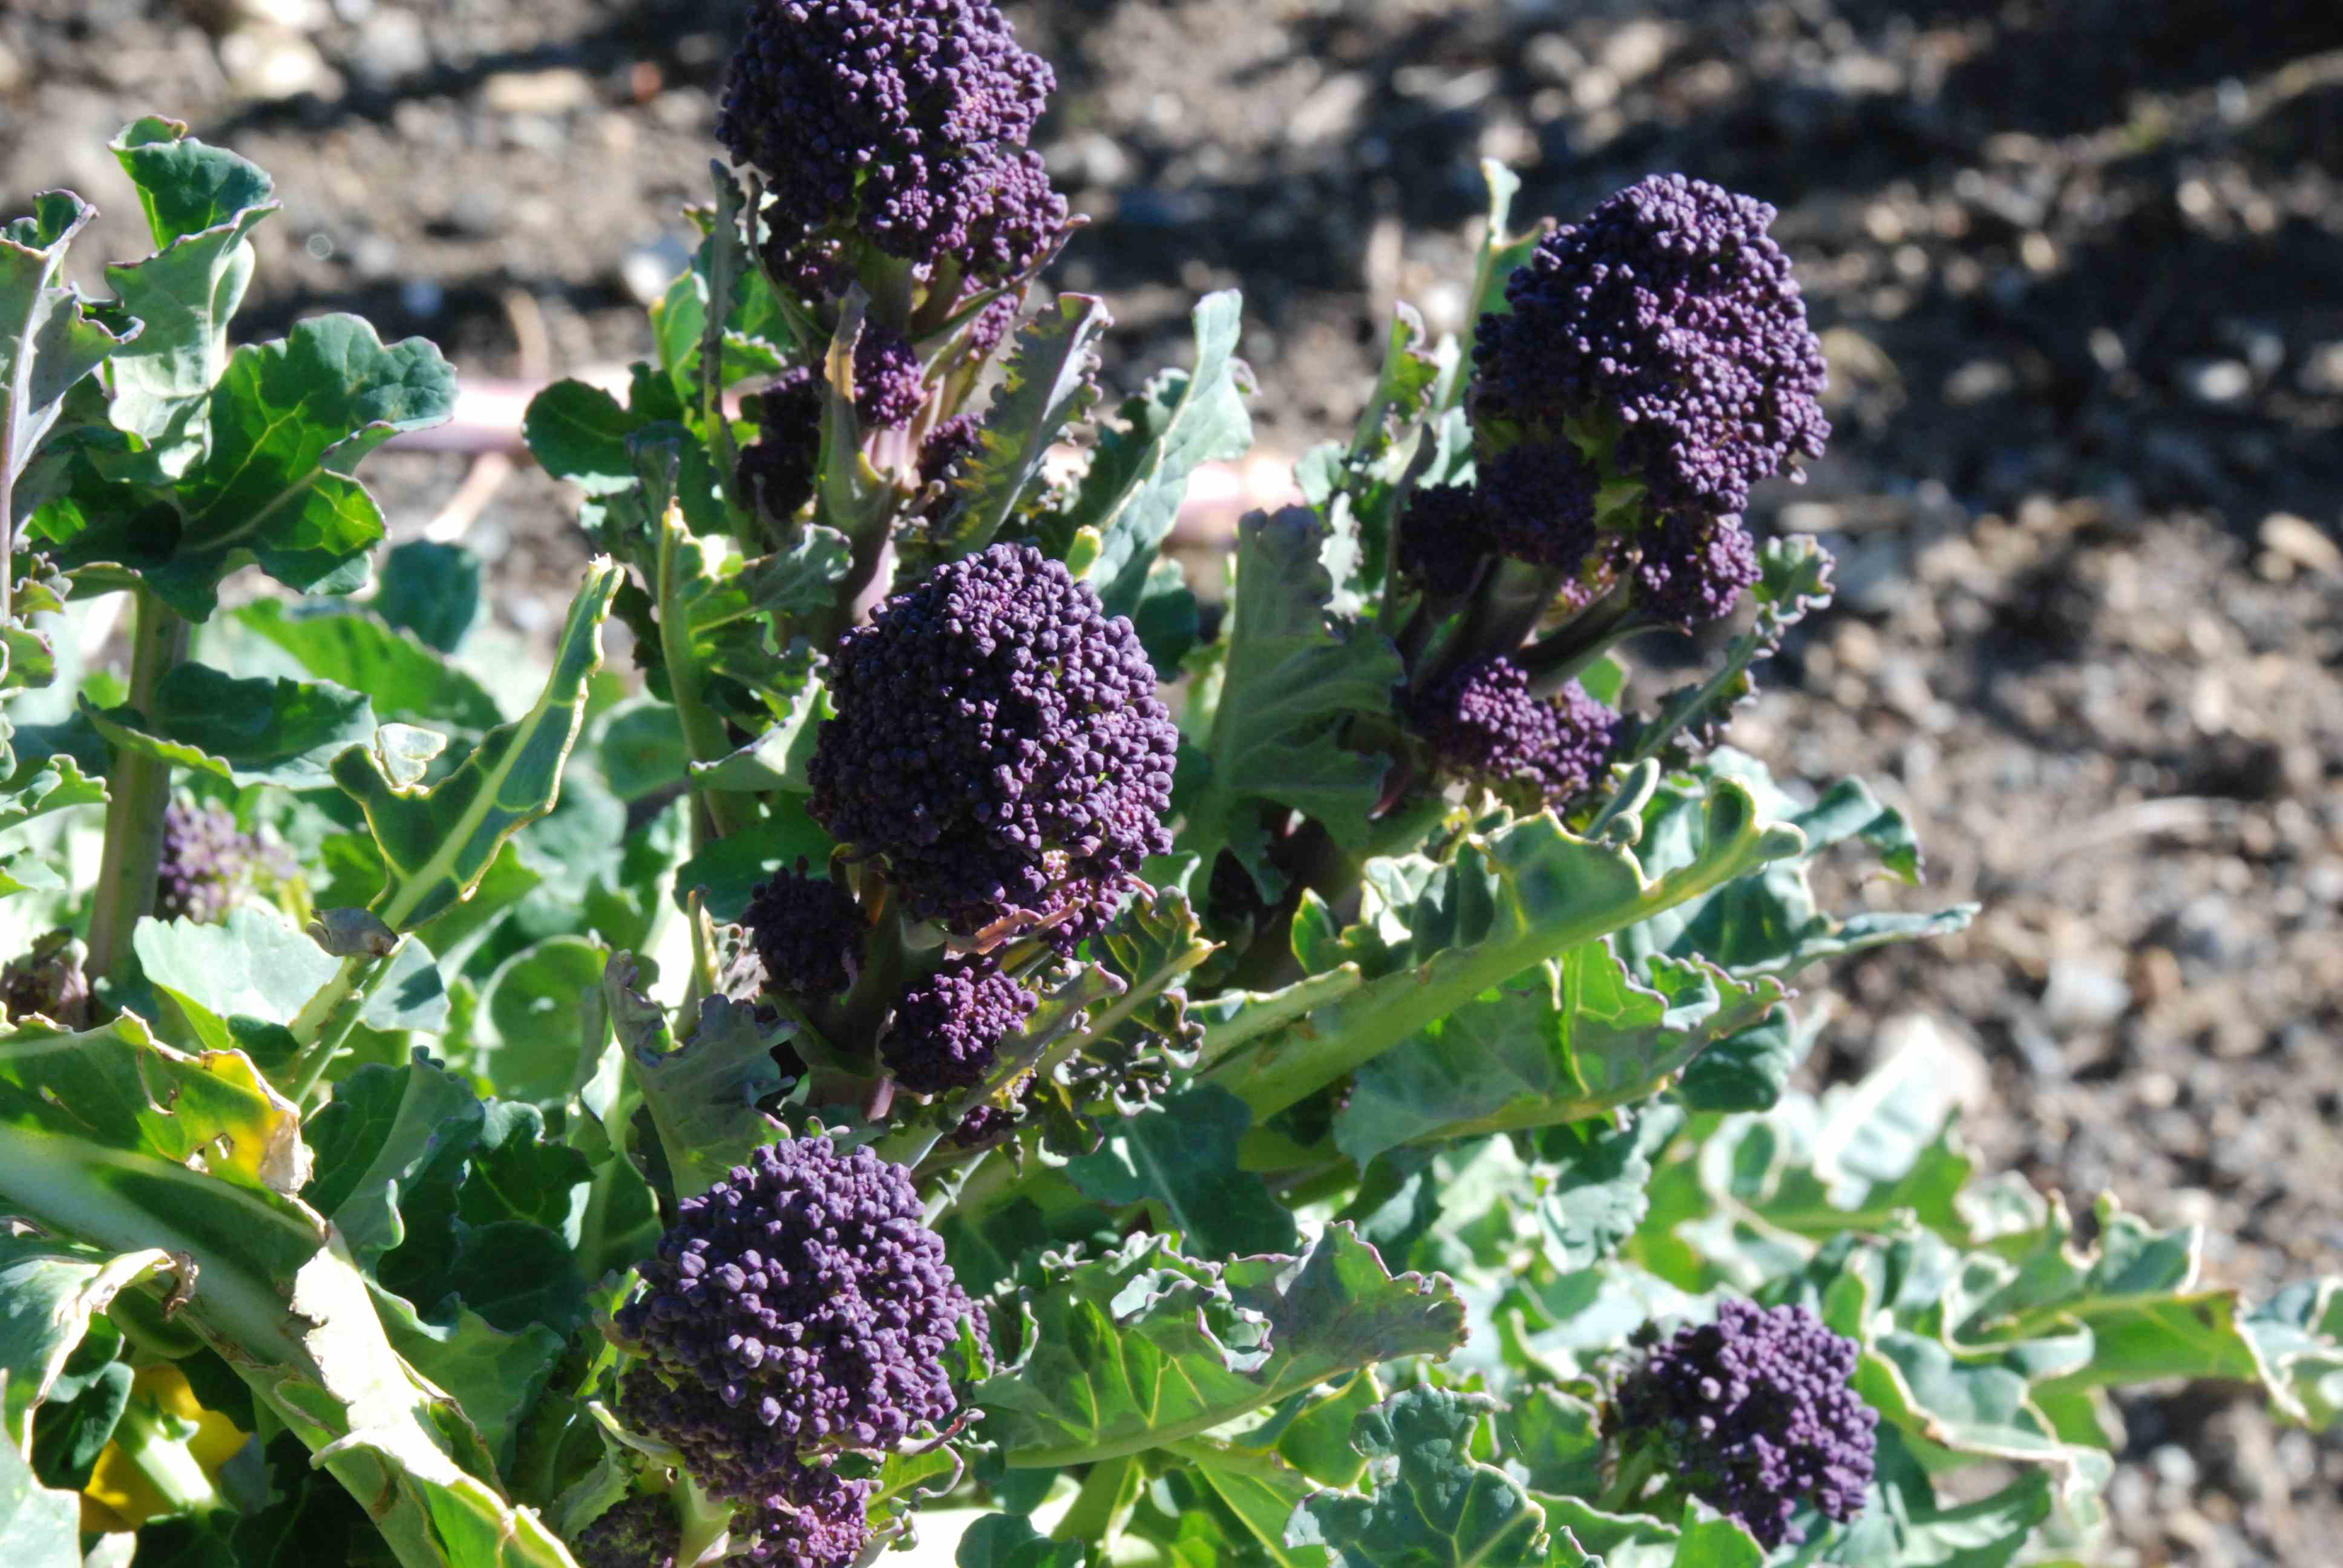 Edible Spring Shoots Broccoli And Mustard The Biking Gardener